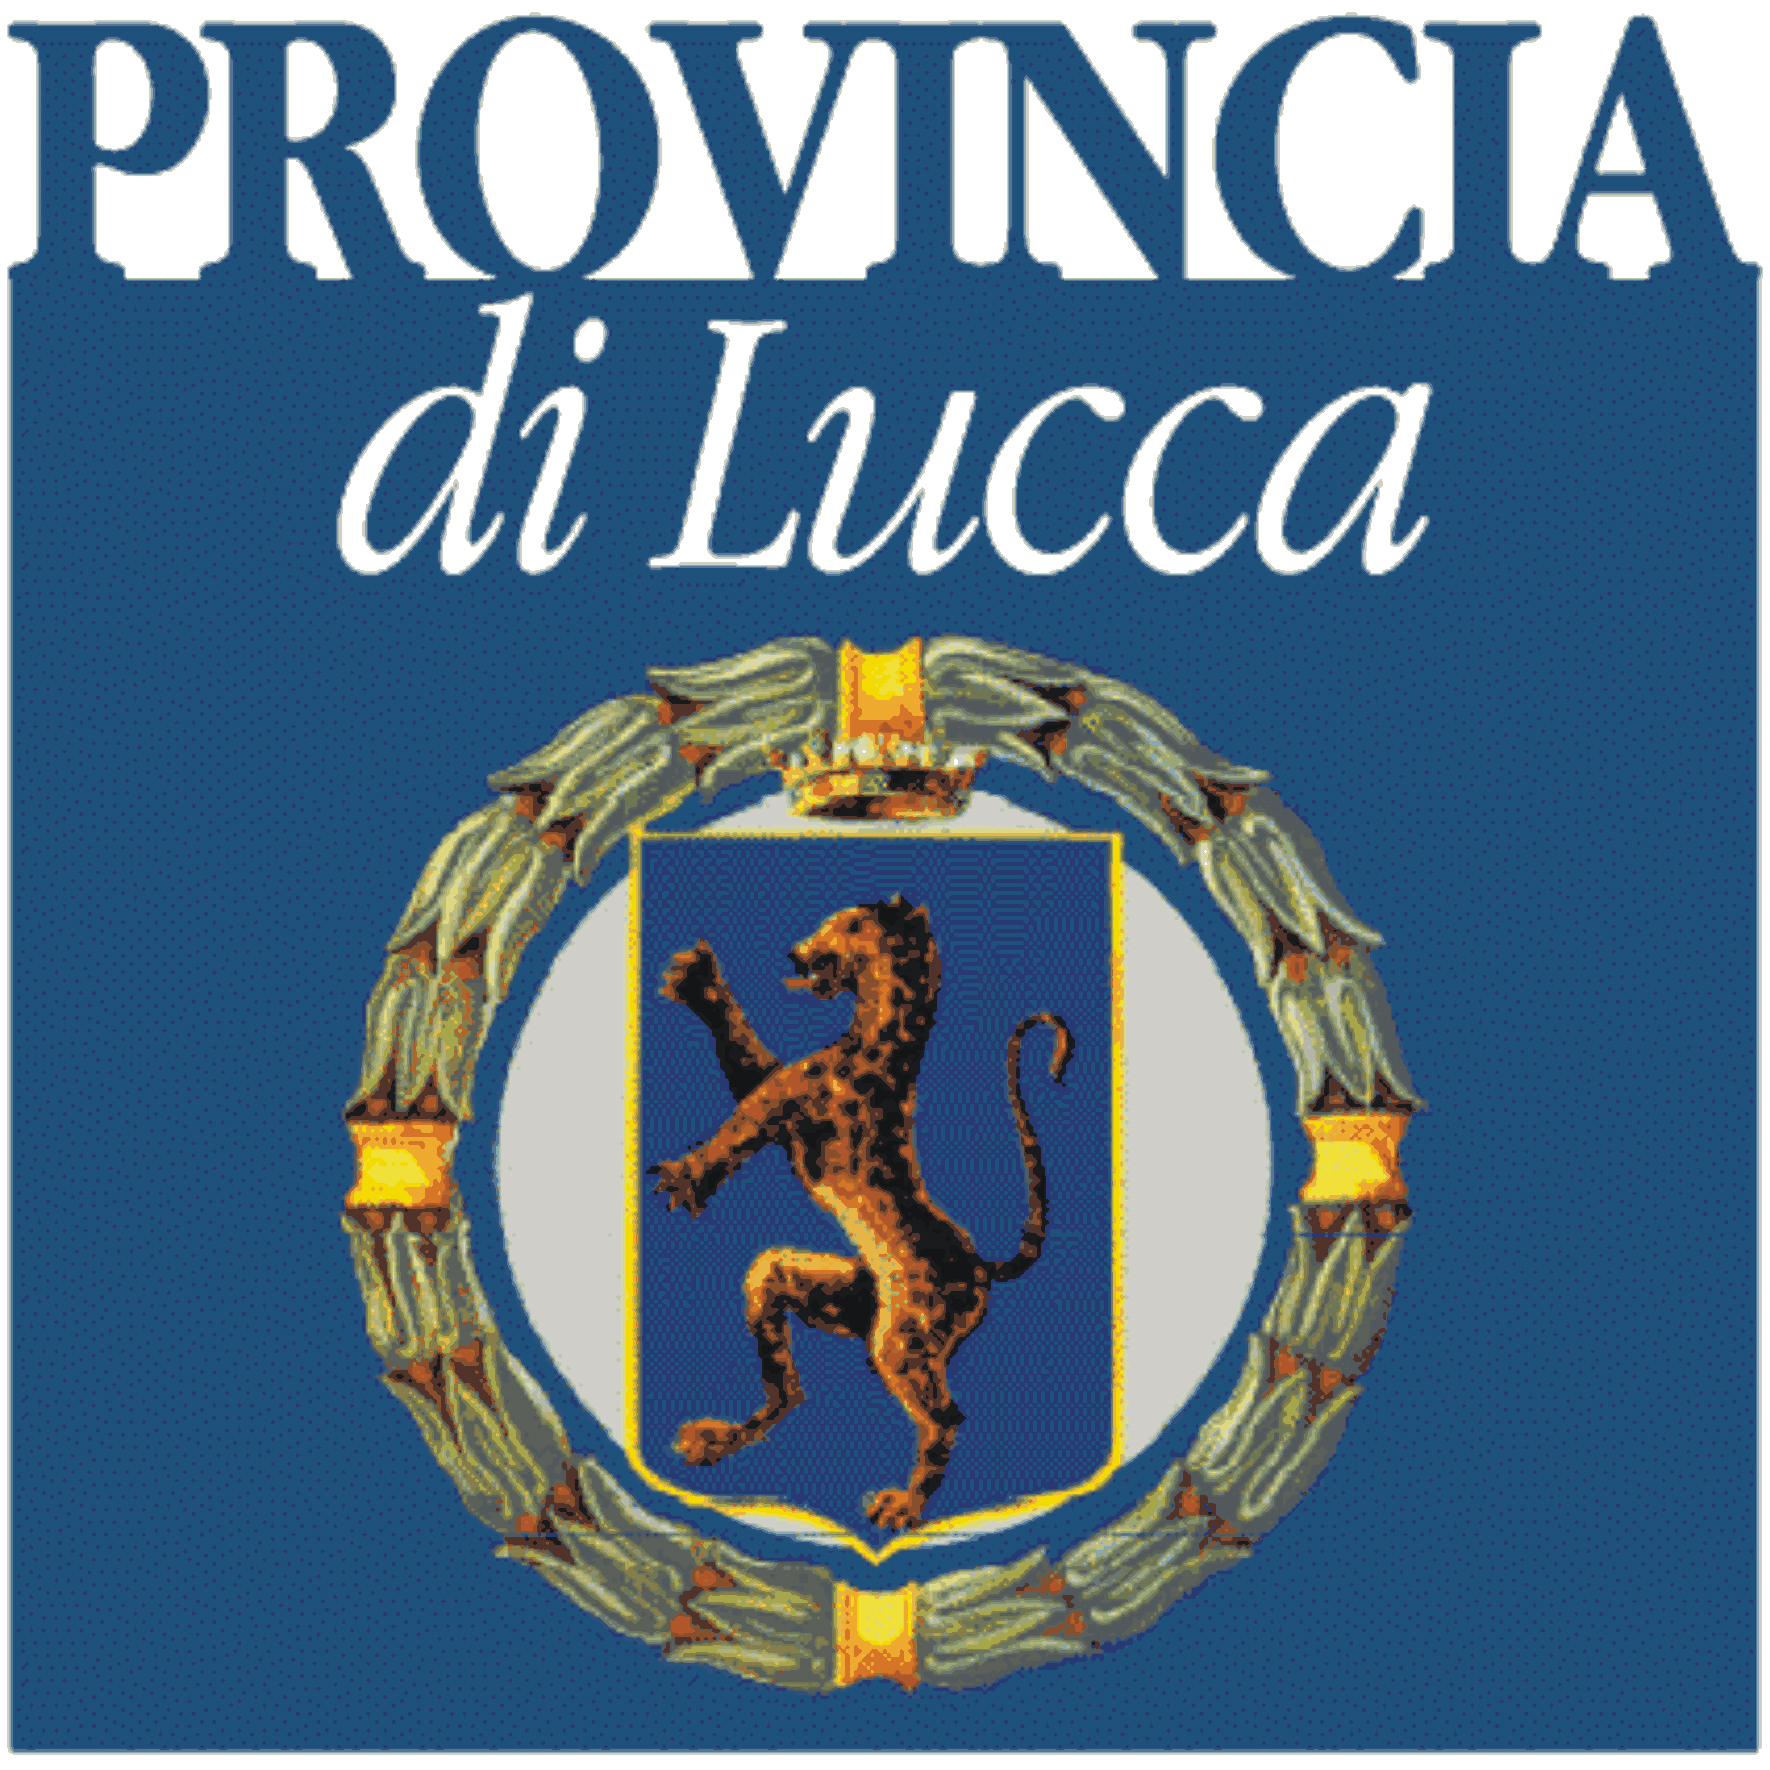 Provincia di Lucca